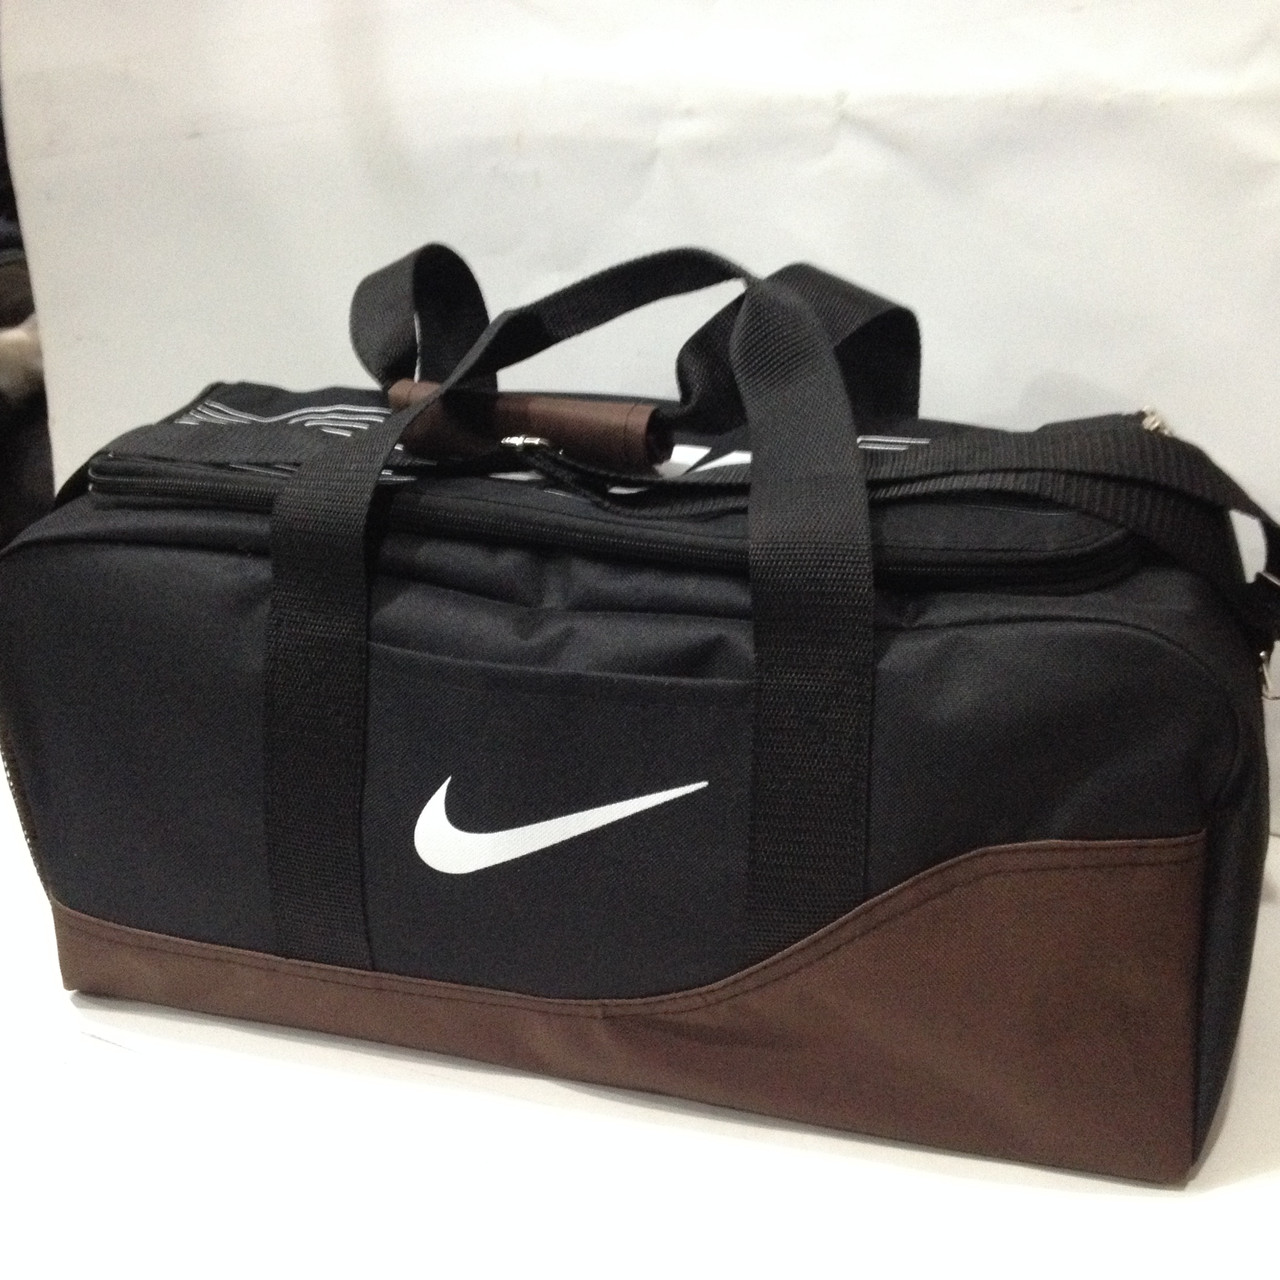 26ab8137 Сумка спортивная Nike FB SHIELD COMPACT DUFFEL 26*52 оптом: продажа ...